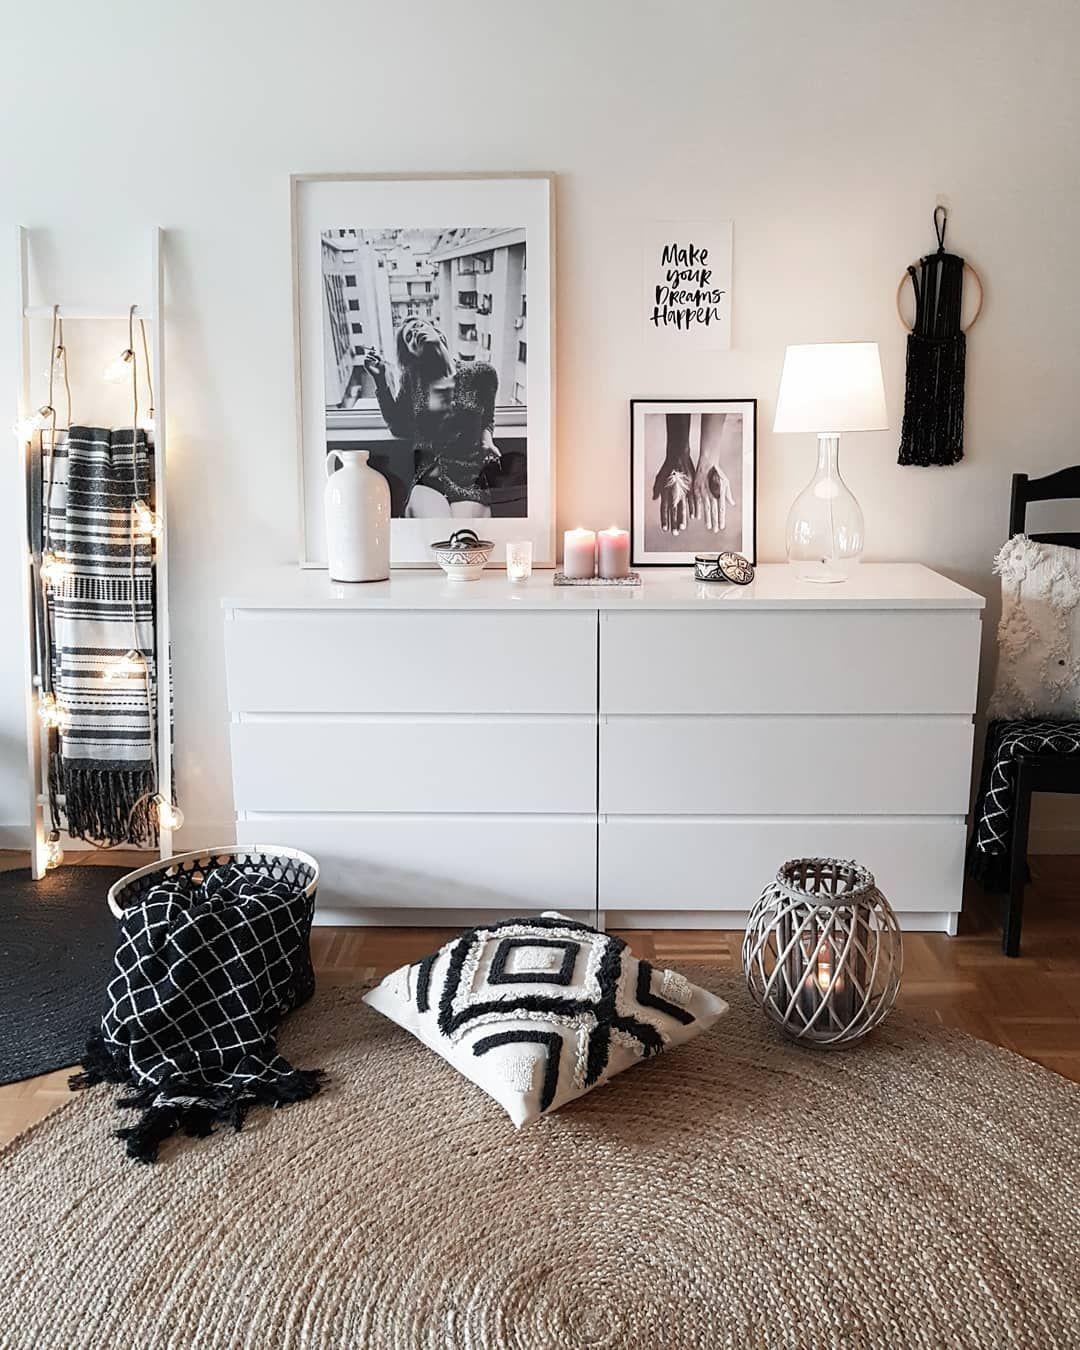 Provenance De La Photo Instagram Mk Nordic Interiordesign Interiors Design Deco En 2020 Deco Appartement Chambre A Coucher Design Idee Decoration Appartement